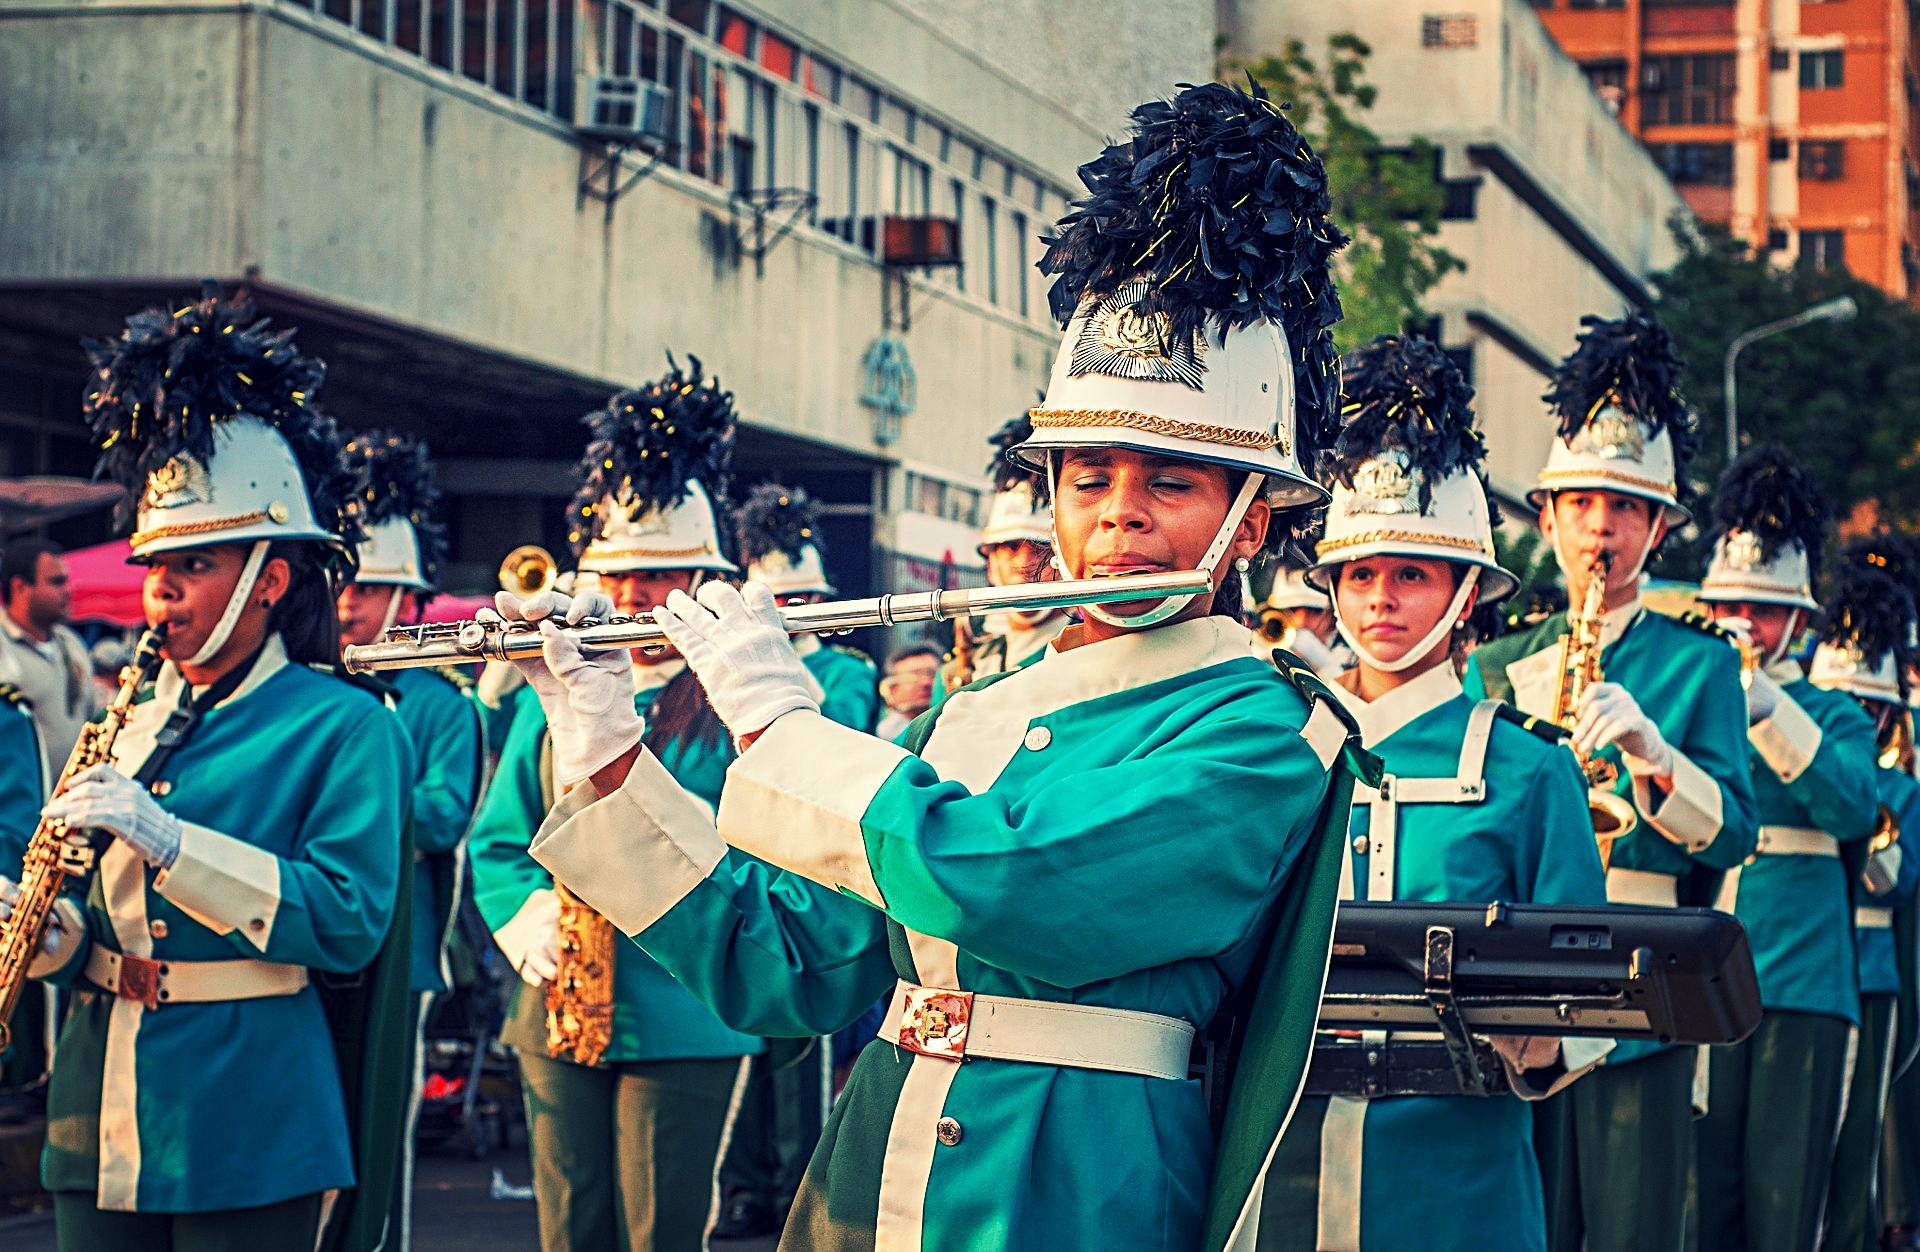 marching band image.jpg